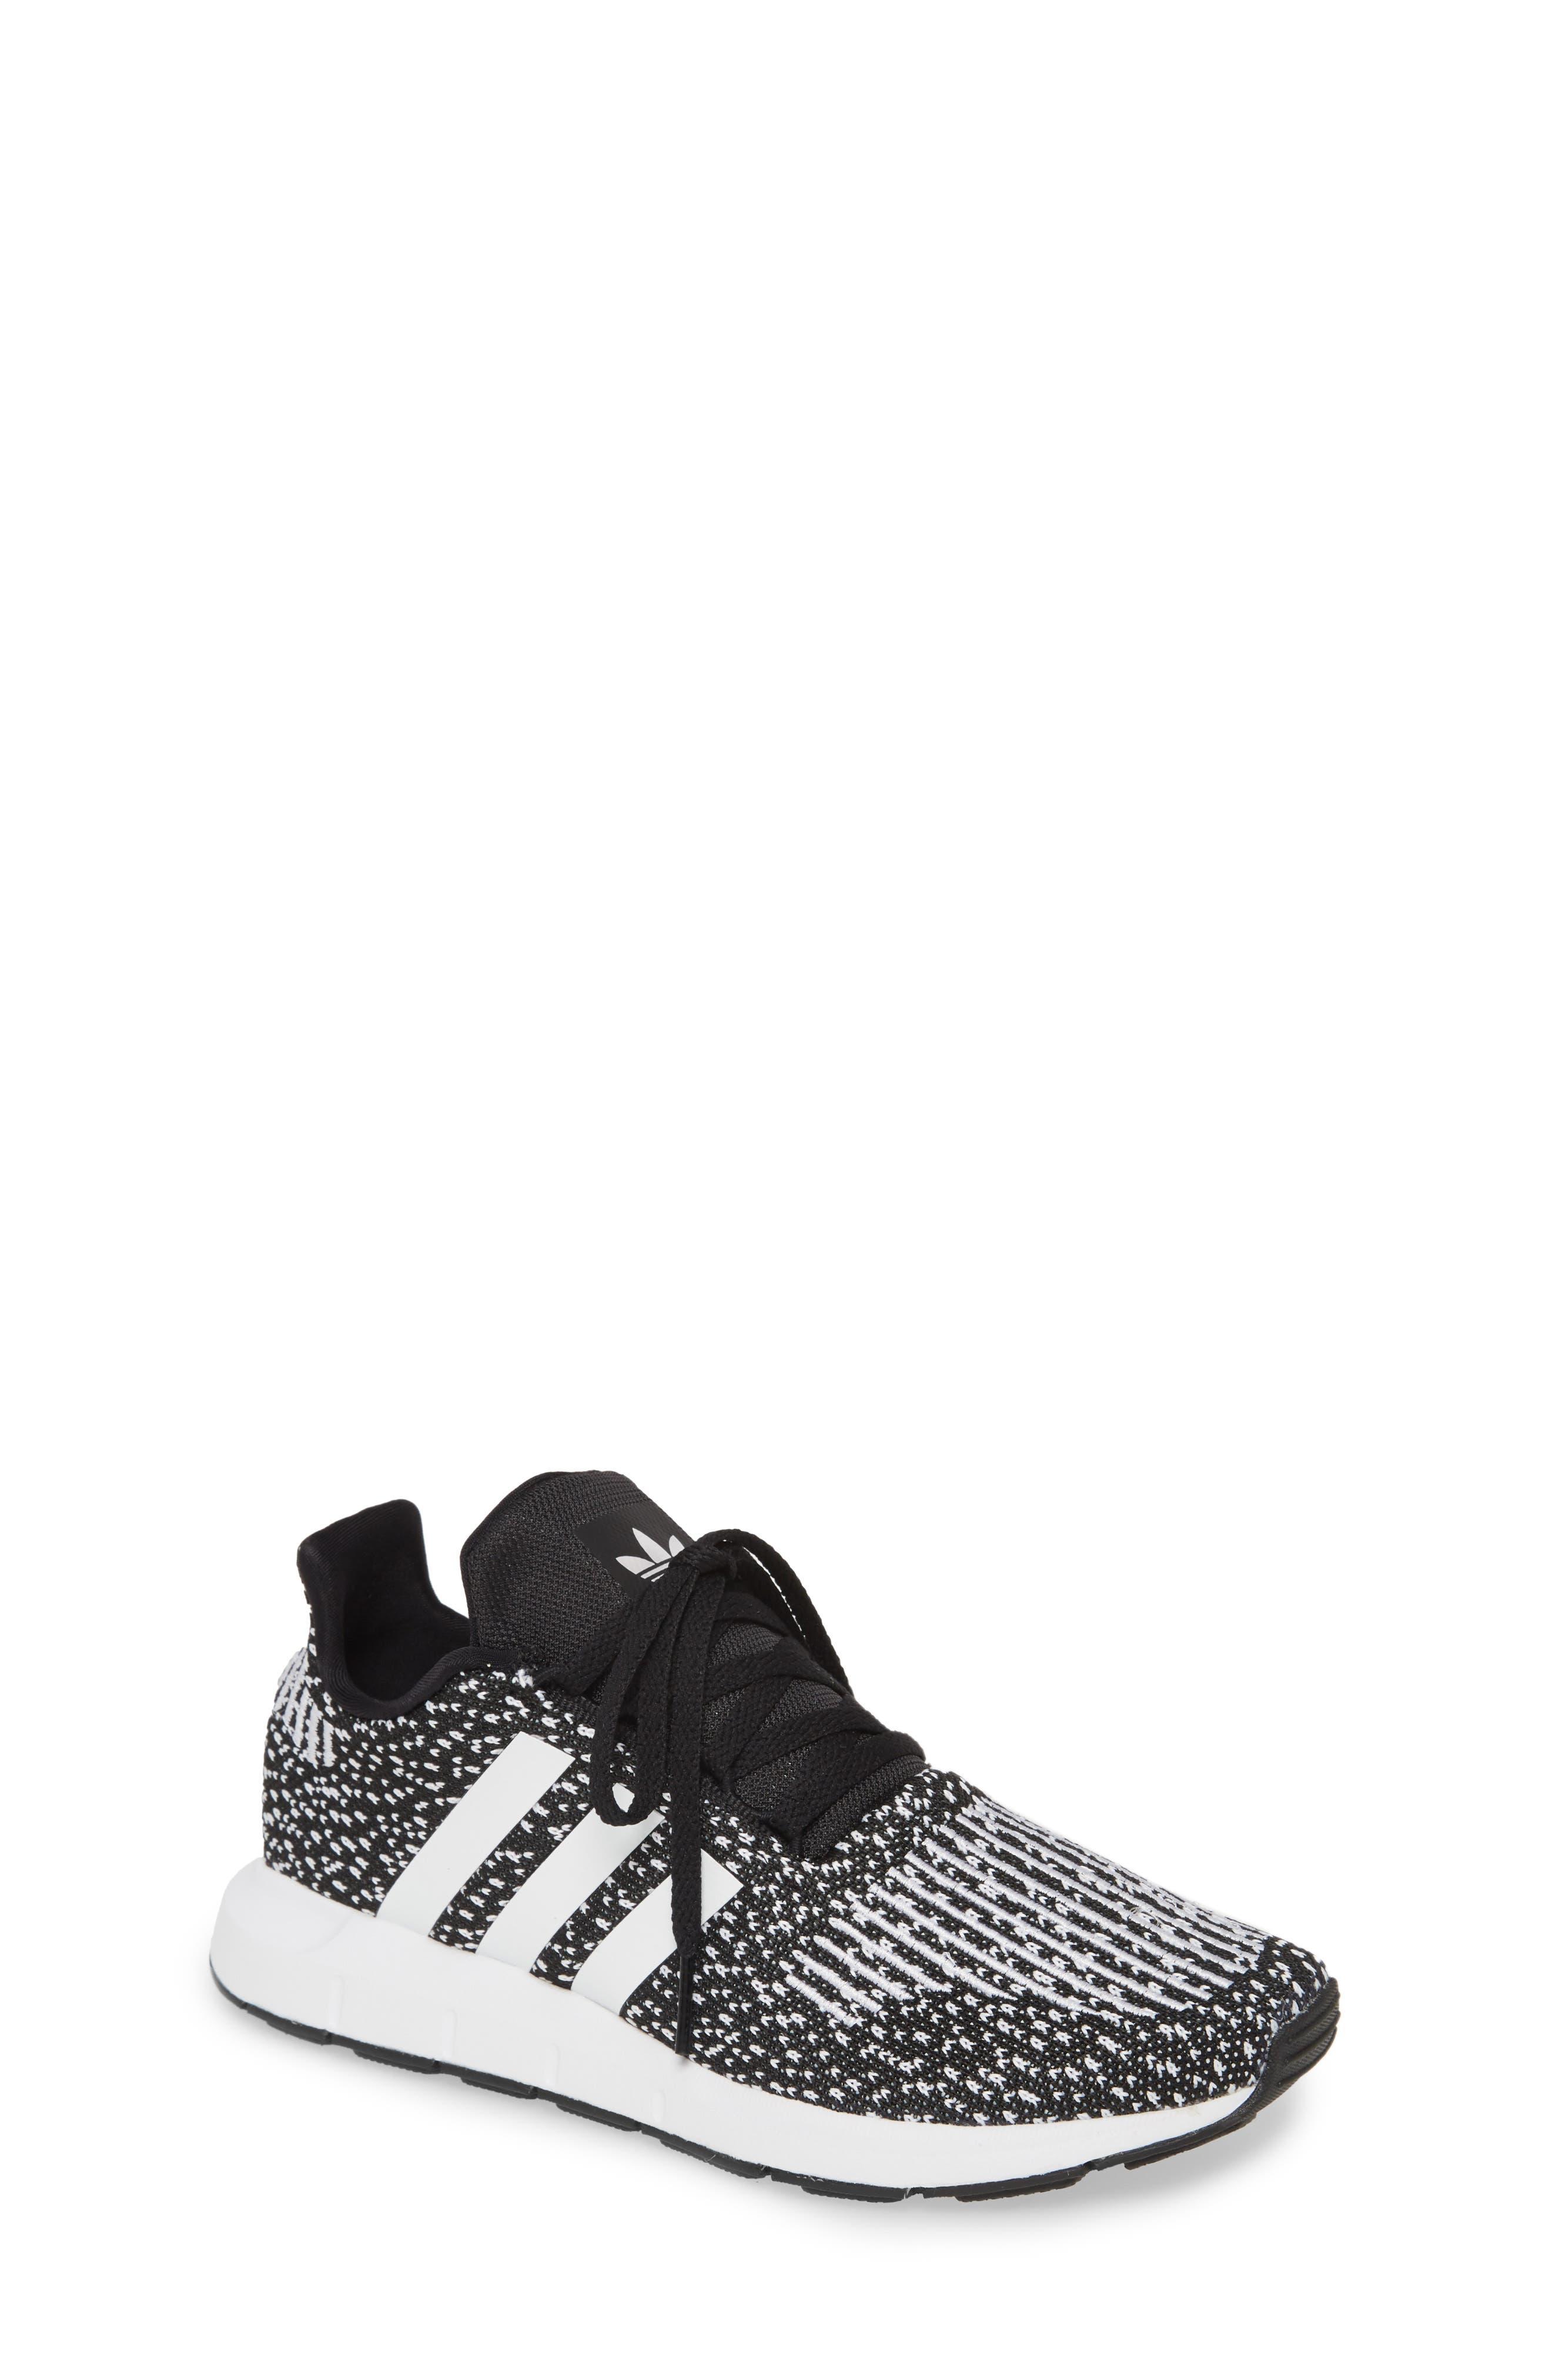 Adidas Adidas Swift Run Sneaker from